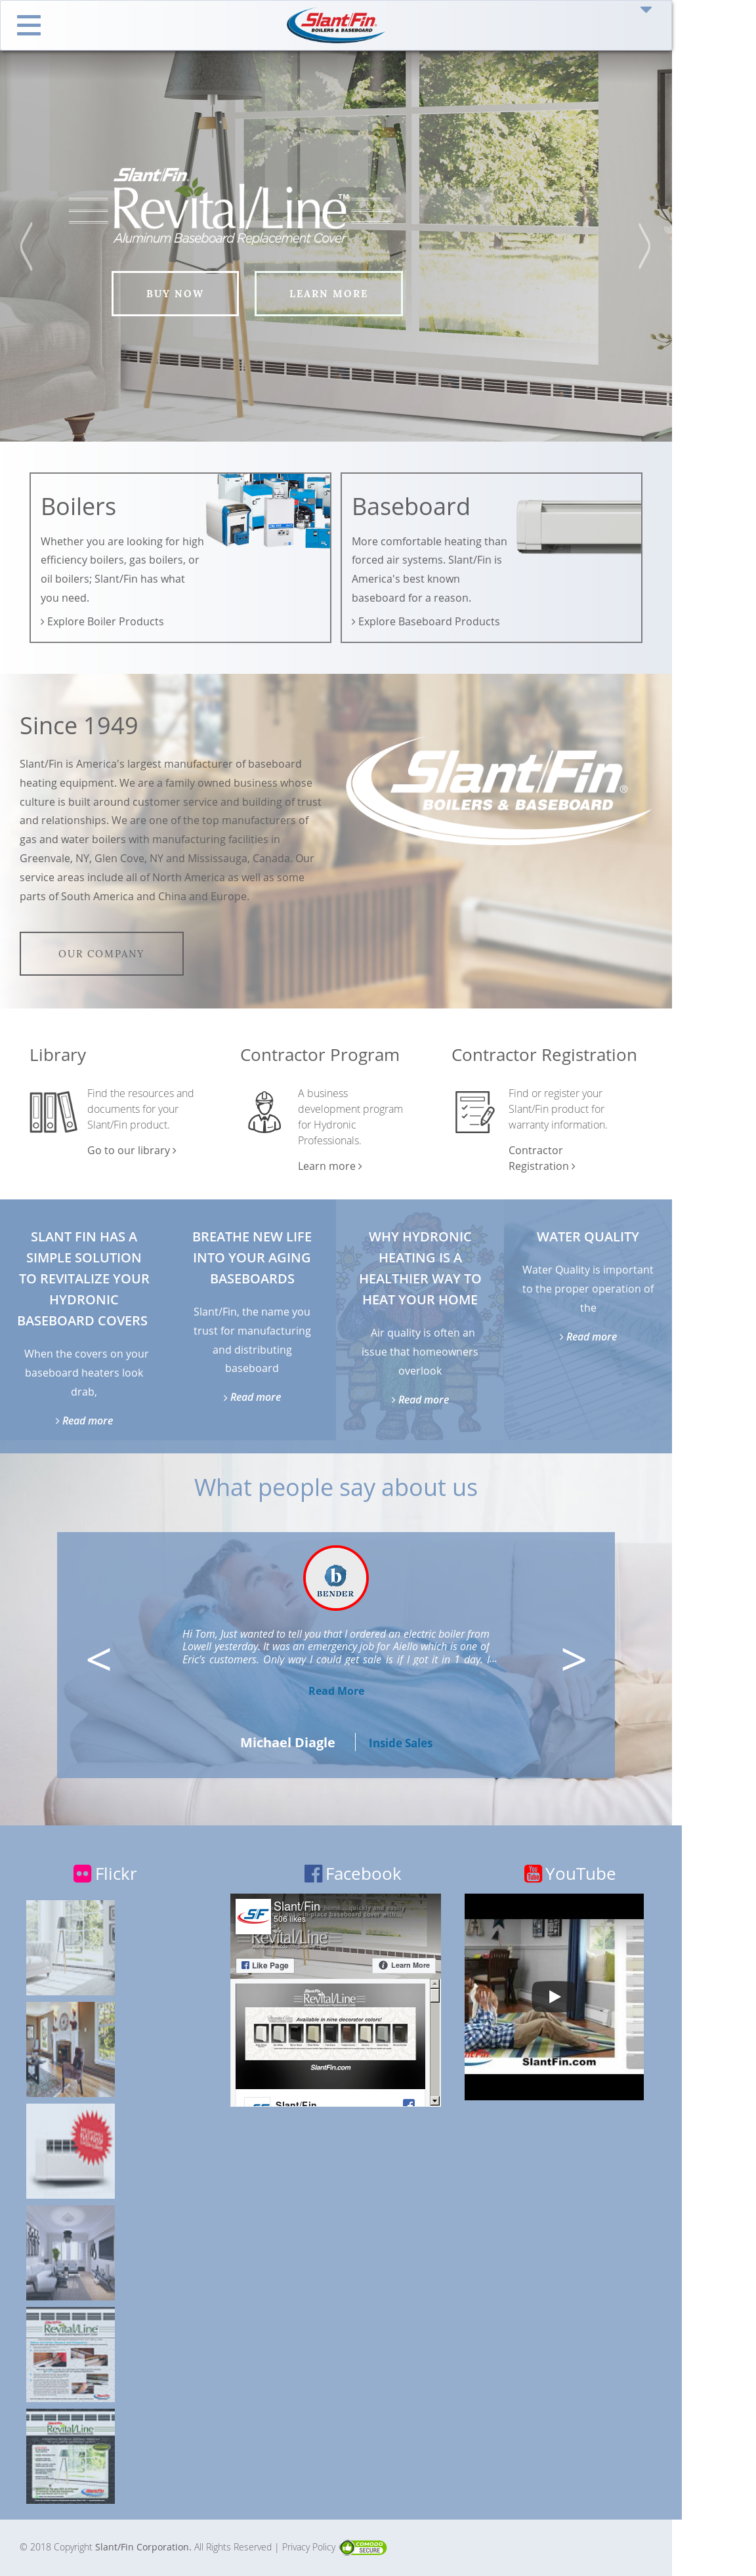 Slant/Fin Competitors, Revenue and Employees - Owler Company Profile